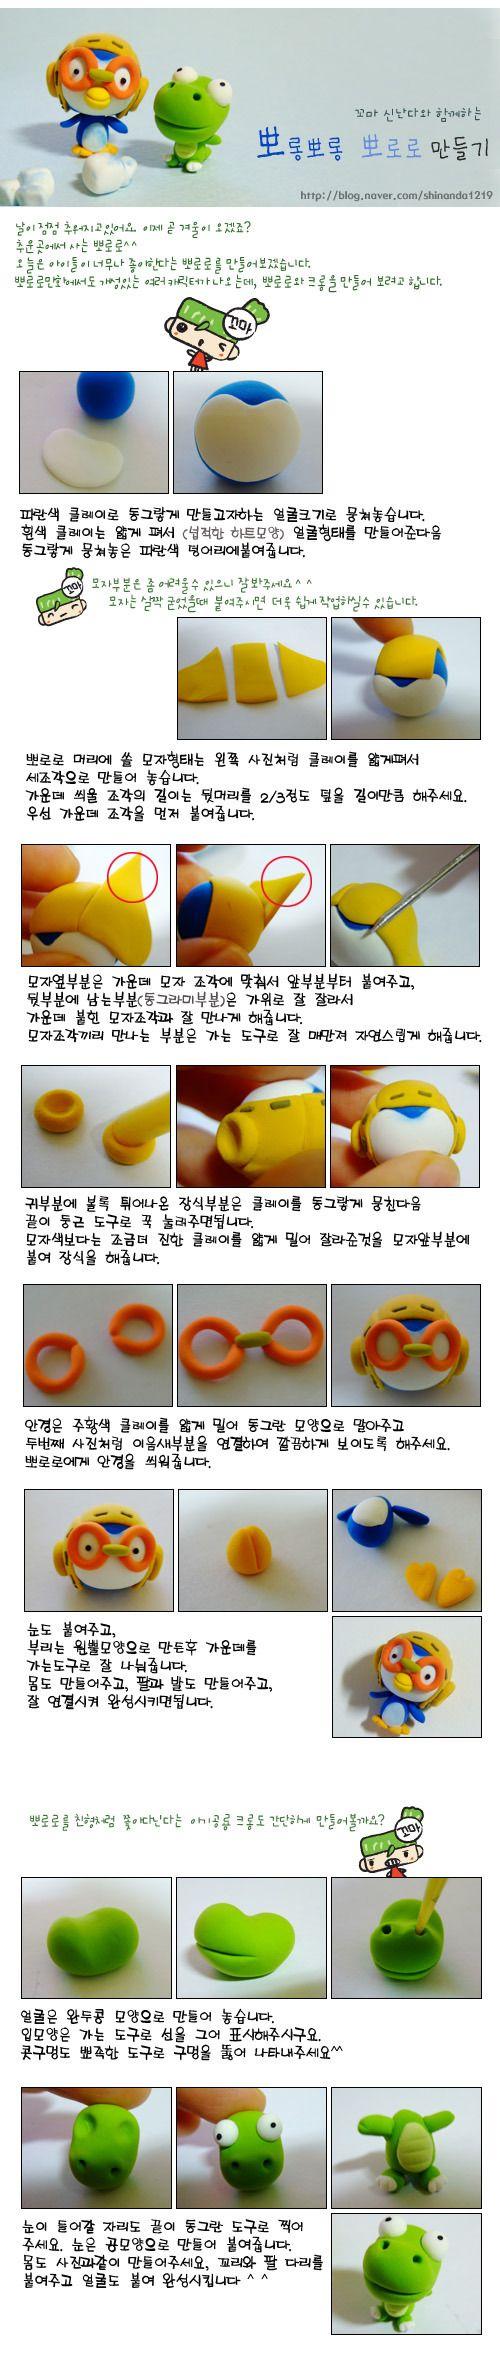 Kawaii Aviator Penguin and Dinosaur Tutorial for Fimo or Polymer Clay